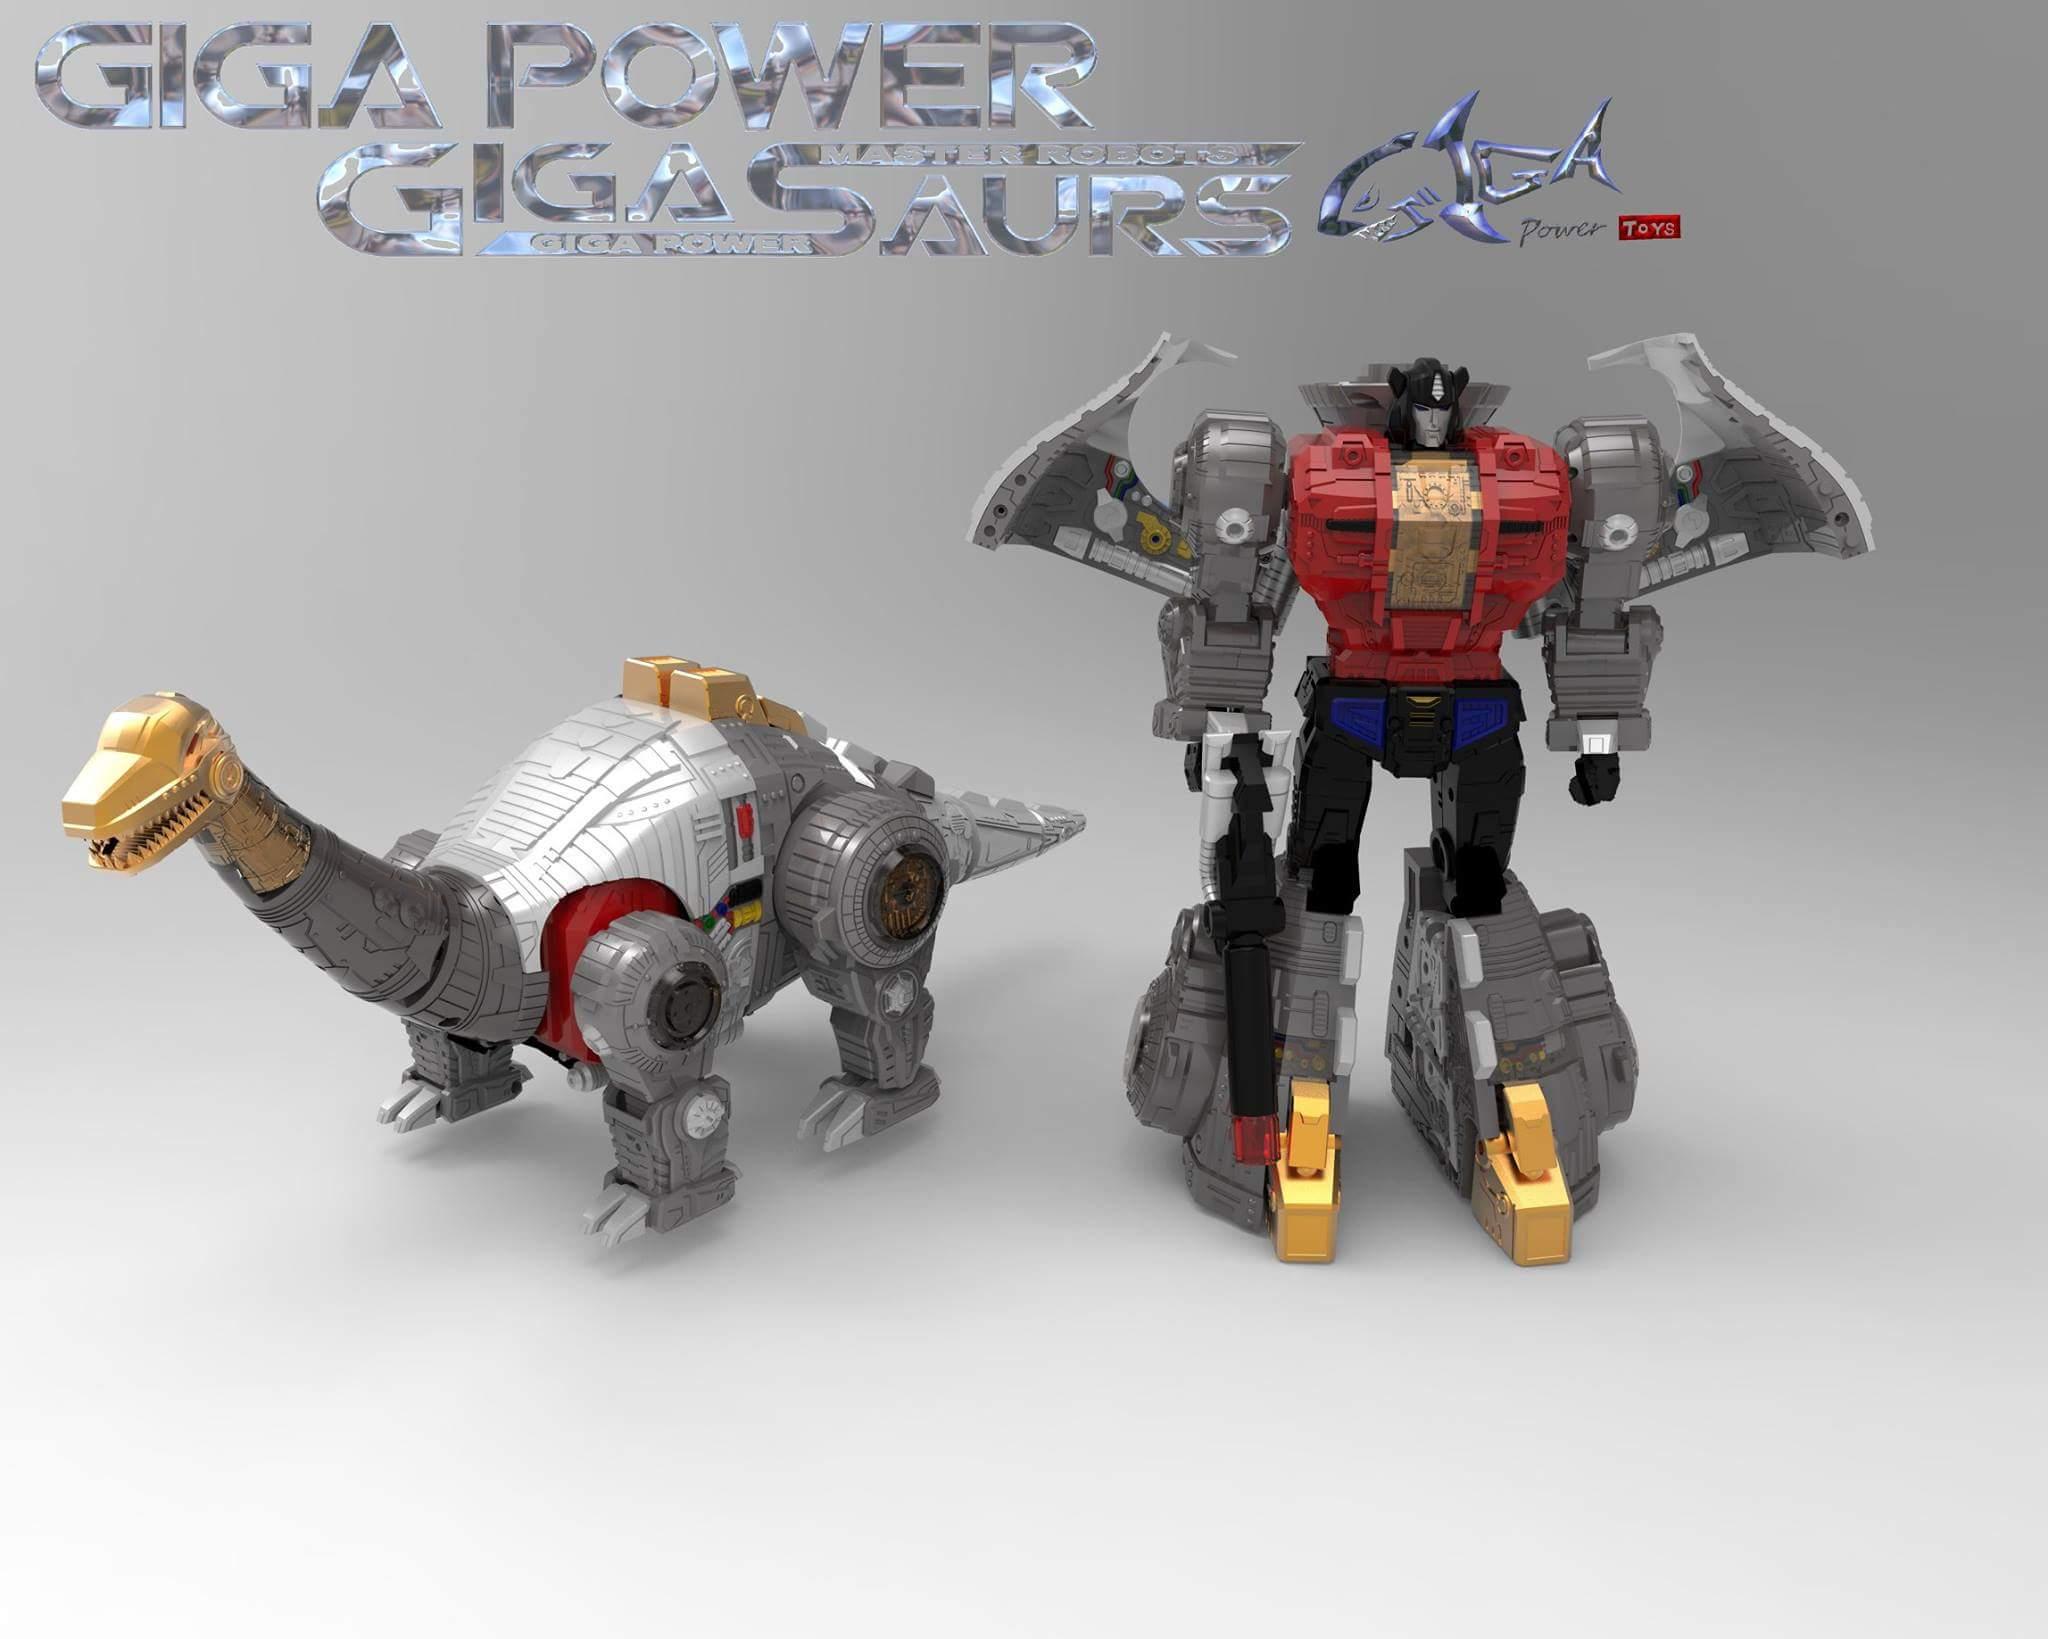 [GigaPower] Produit Tiers - Jouets HQ-01 Superator + HQ-02 Grassor + HQ-03 Guttur + HQ-04 Graviter + HQ-05 Gaudenter - aka Dinobots - Page 5 GDtQ9zDI